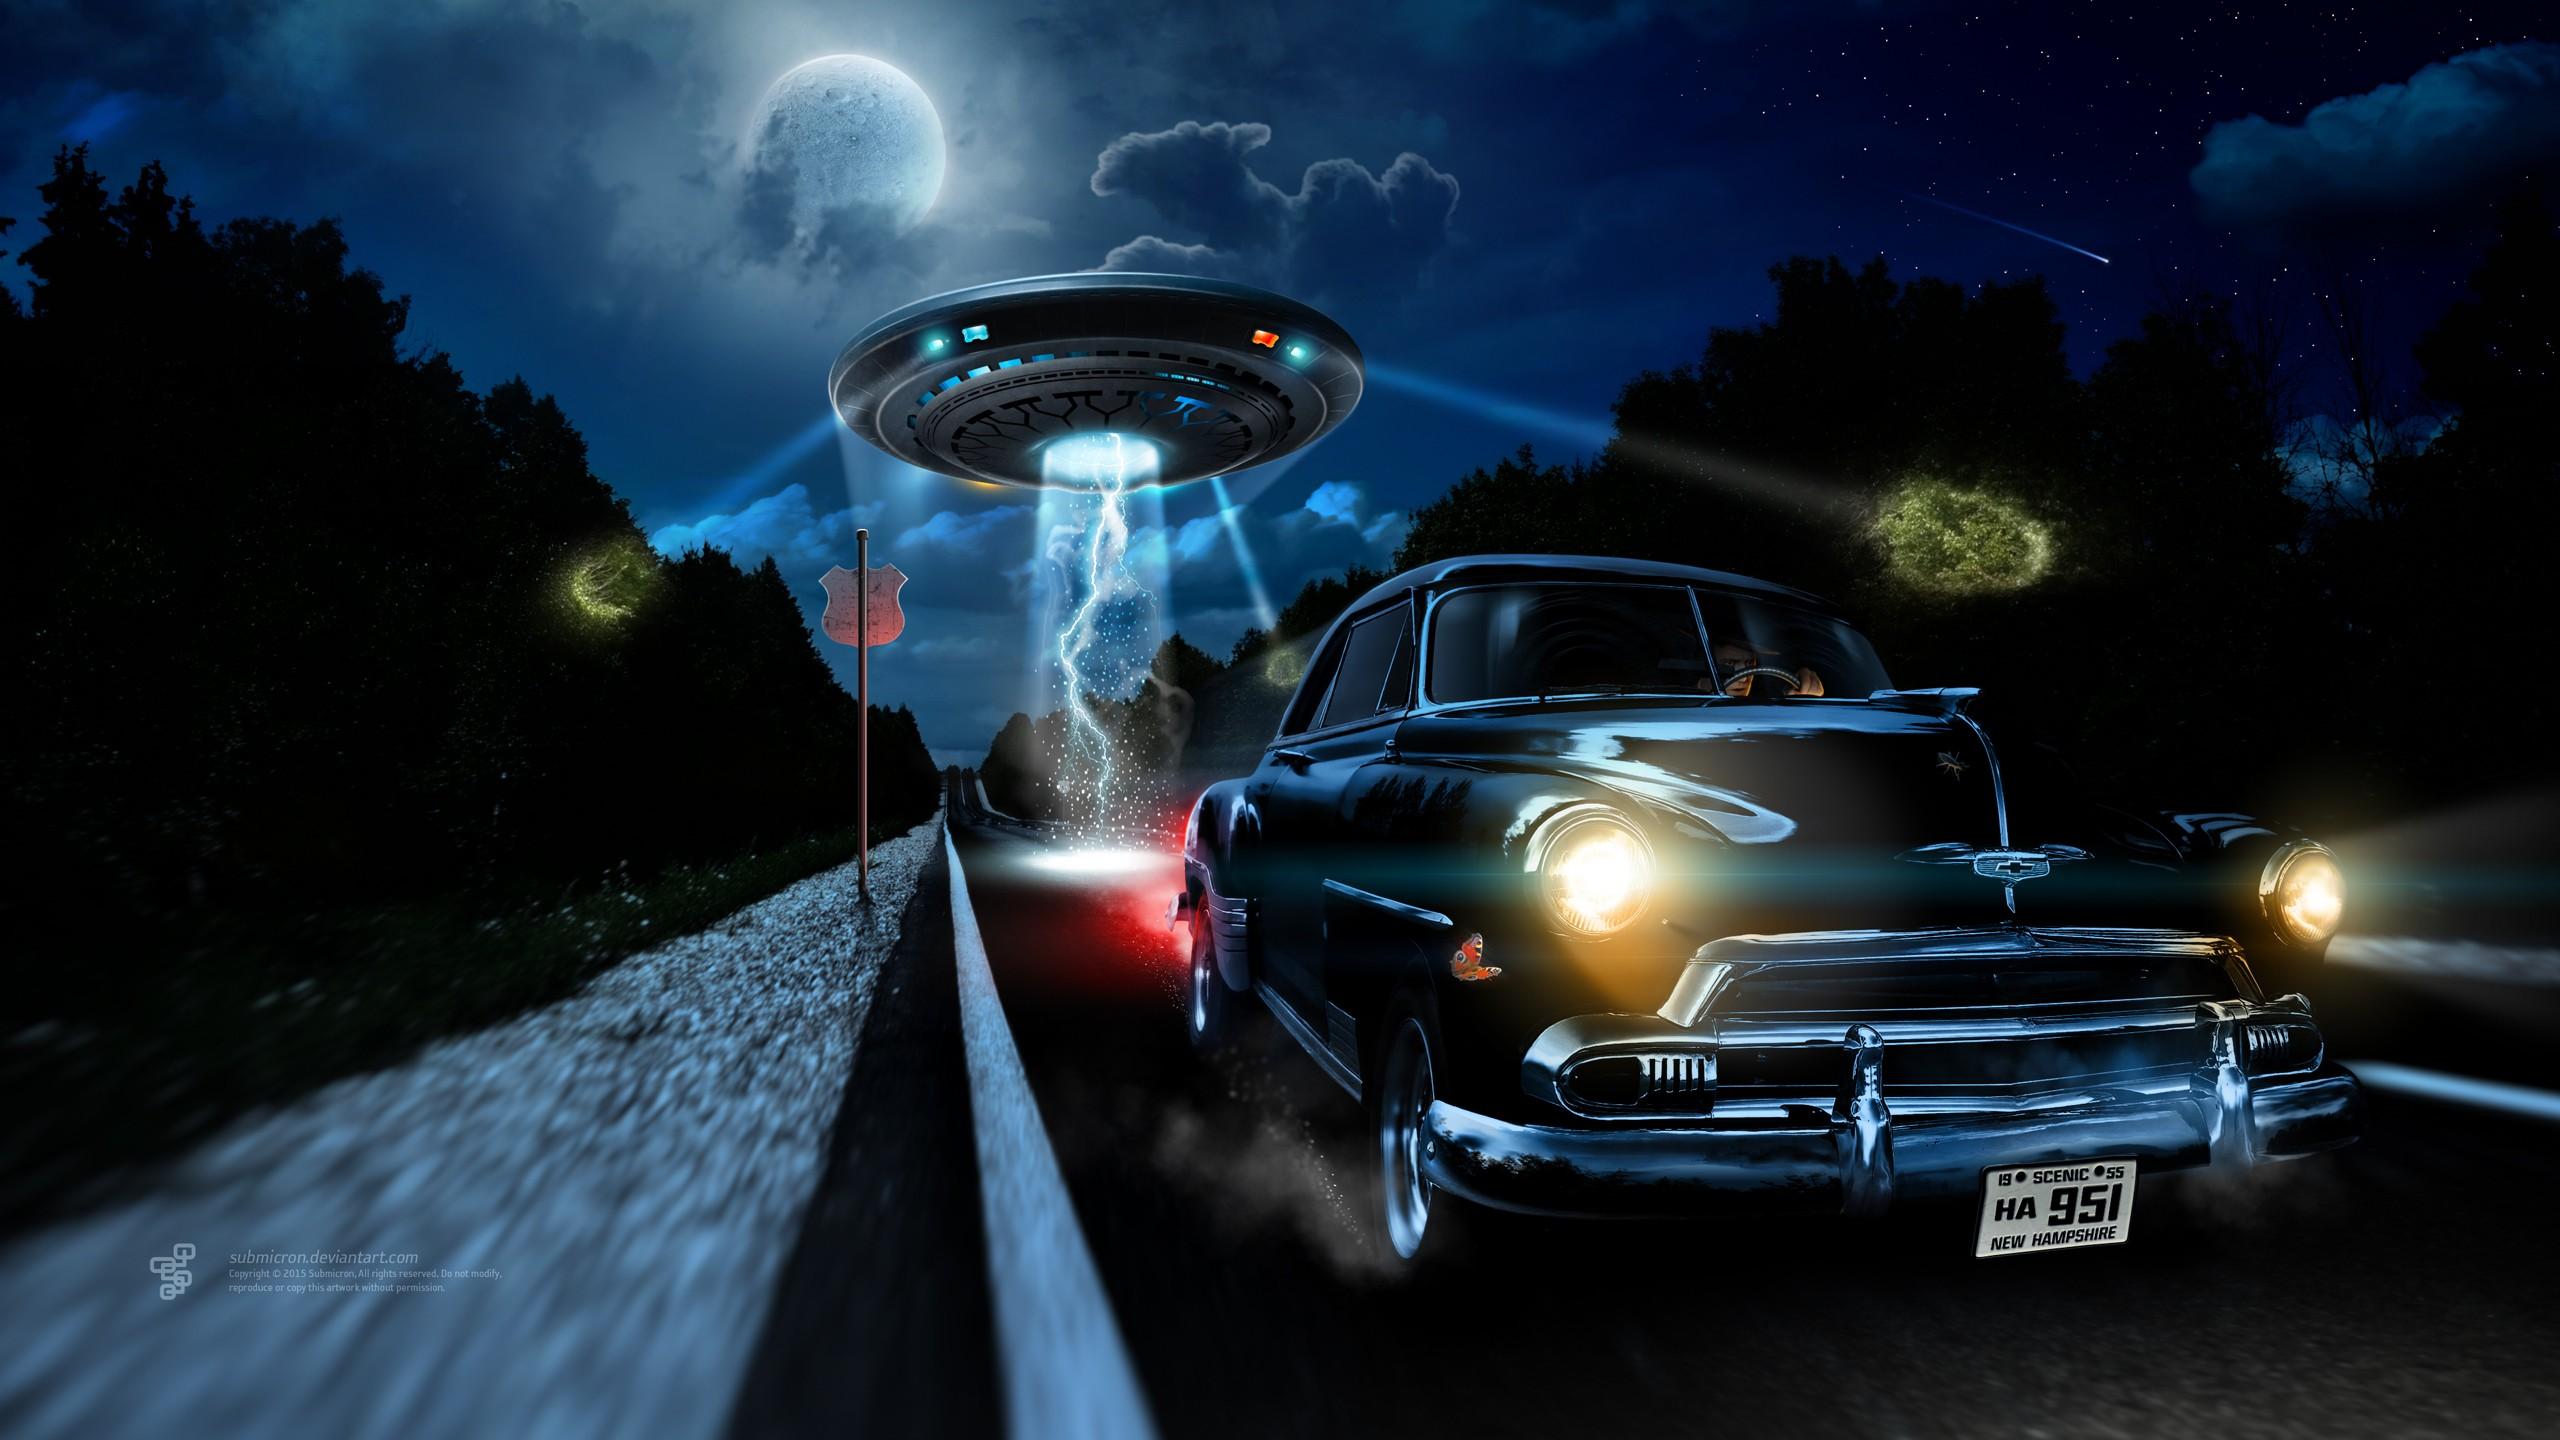 Wallpaper 2560x1440 Px Aliens Car Chevrolet Clouds